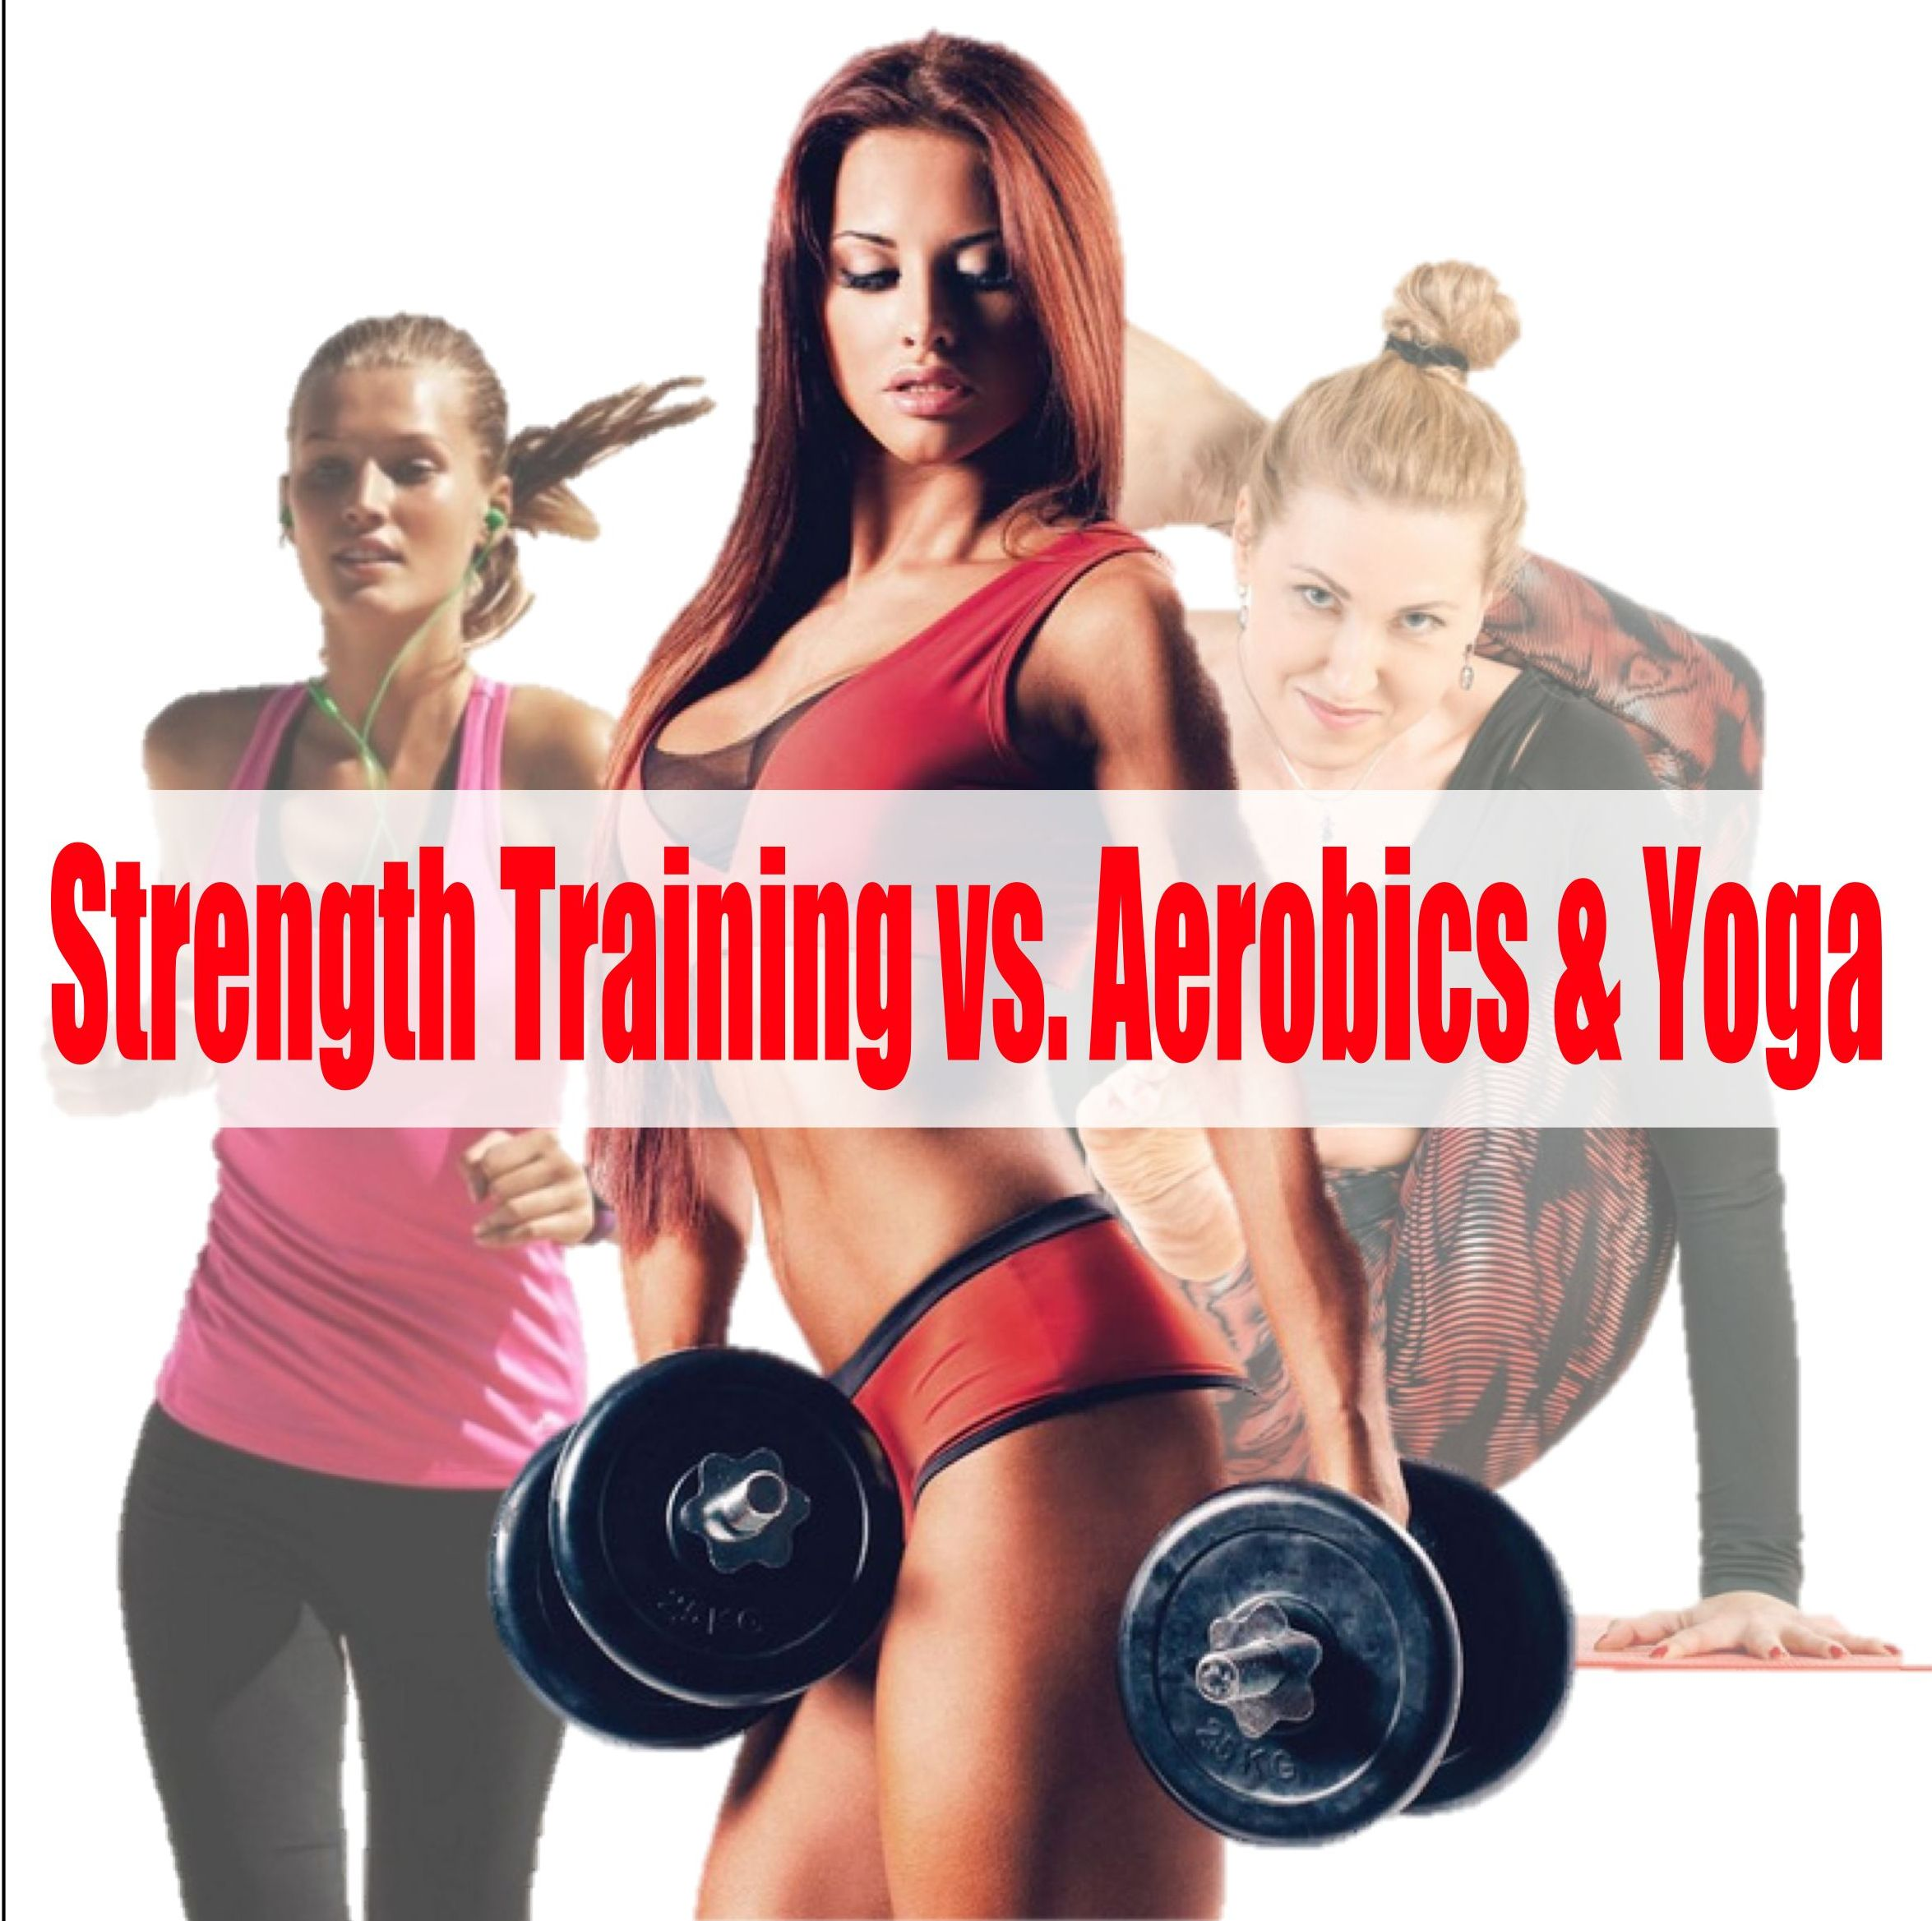 Strength training vs. yoga or aerobics